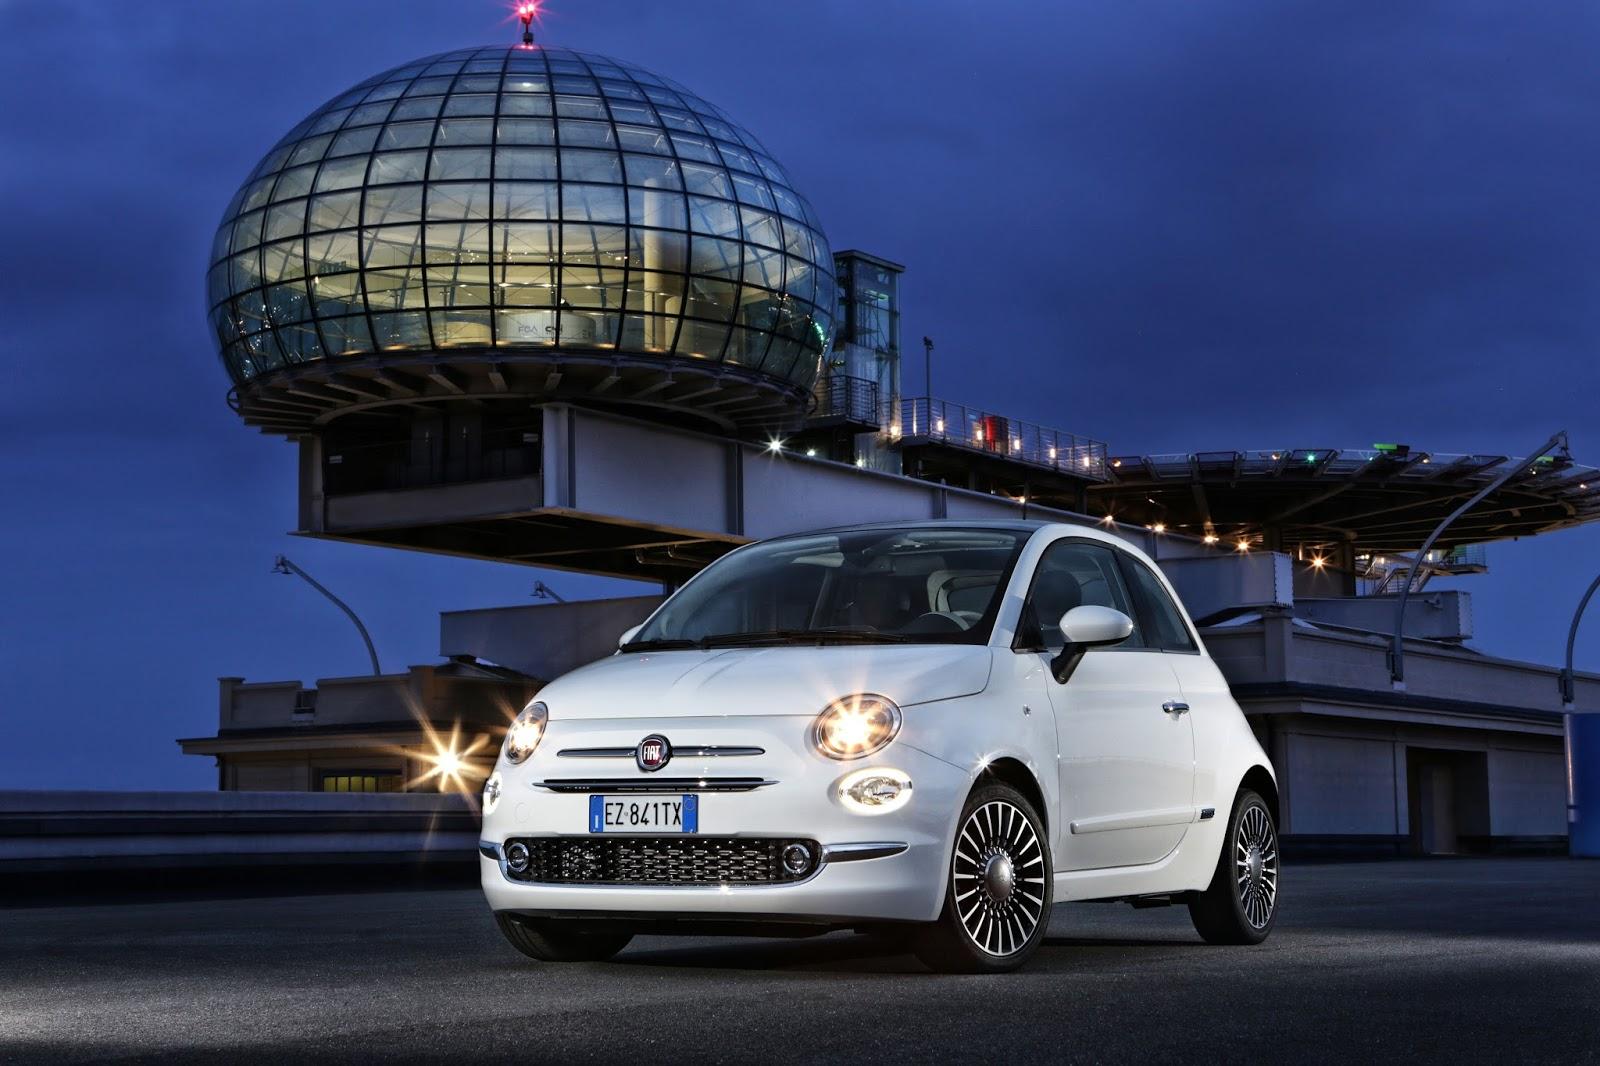 150703 FIAT Nuova 500 01 Η άφιξη του νέου Fiat 500 είναι γεγονός